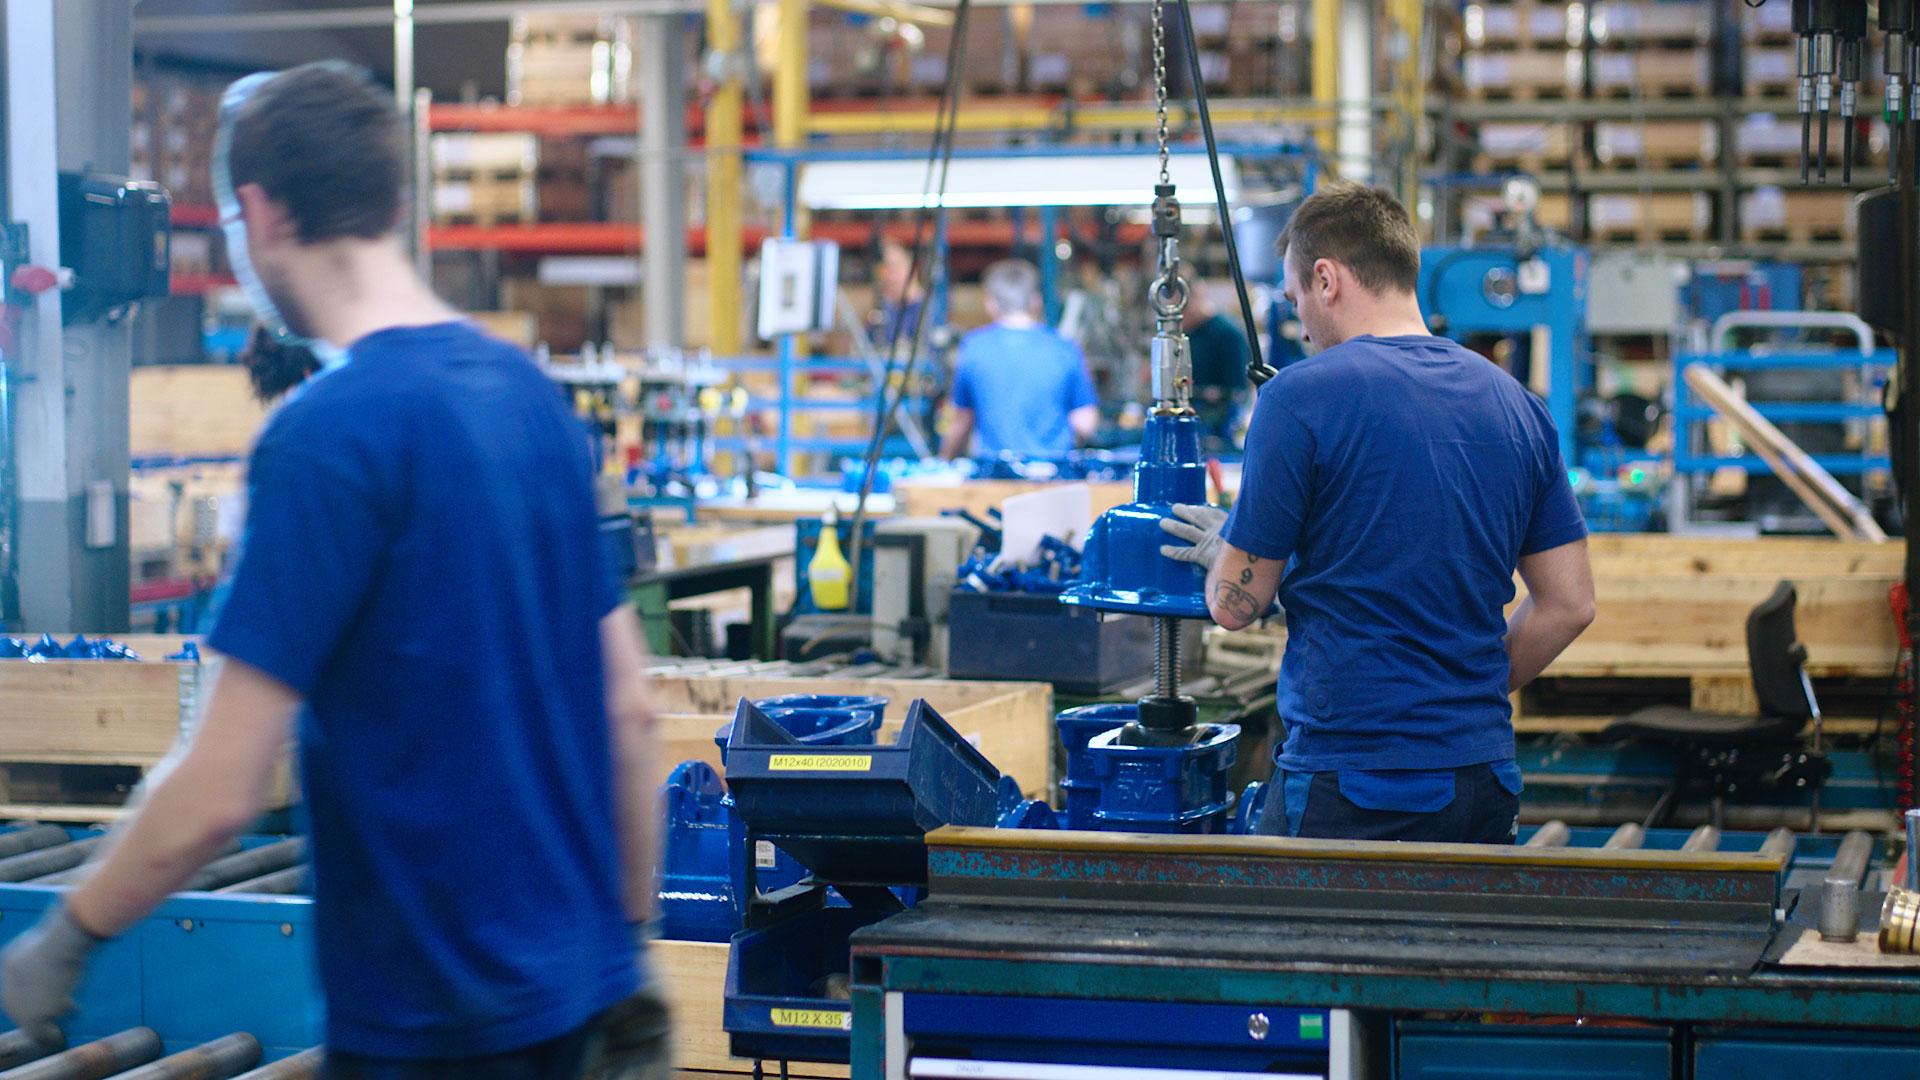 Inside the factory at AVK International